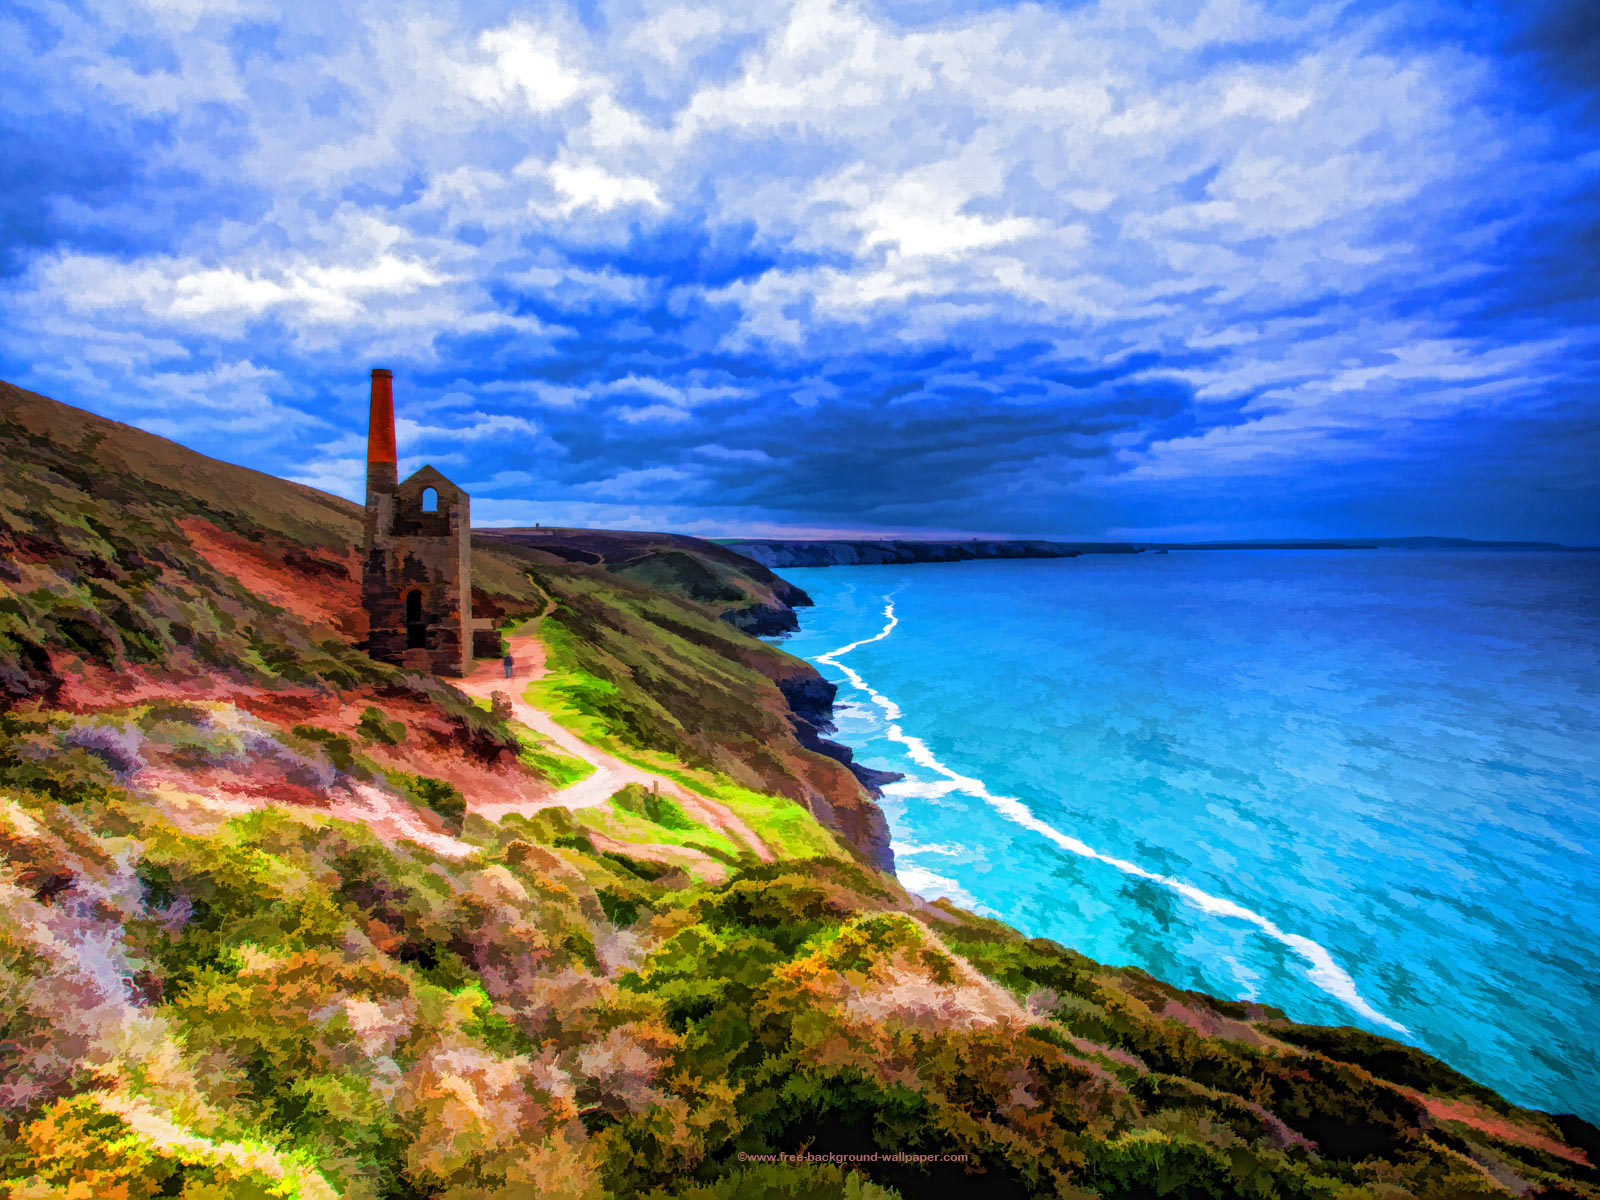 Tin Mine in Cornwall Artistic Backgrounds   1600x1200 pixels 1600x1200